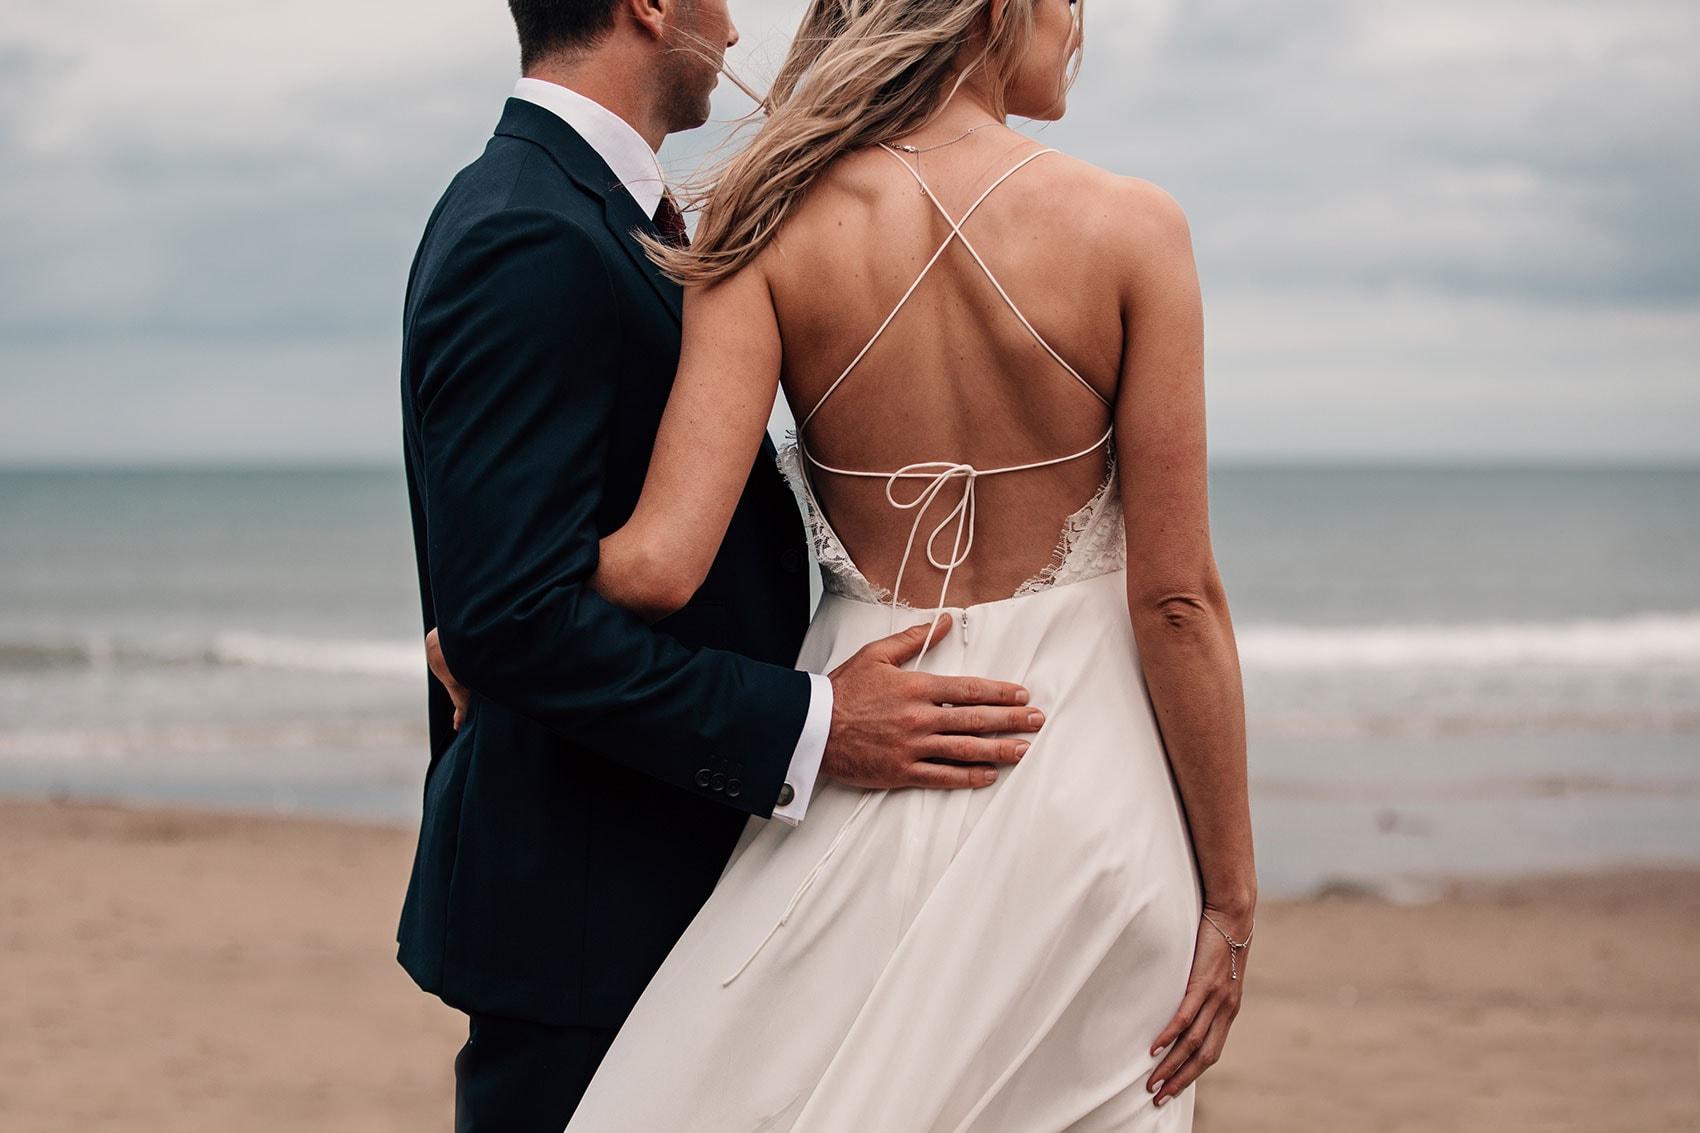 bride and groom beach wedding photoshoot